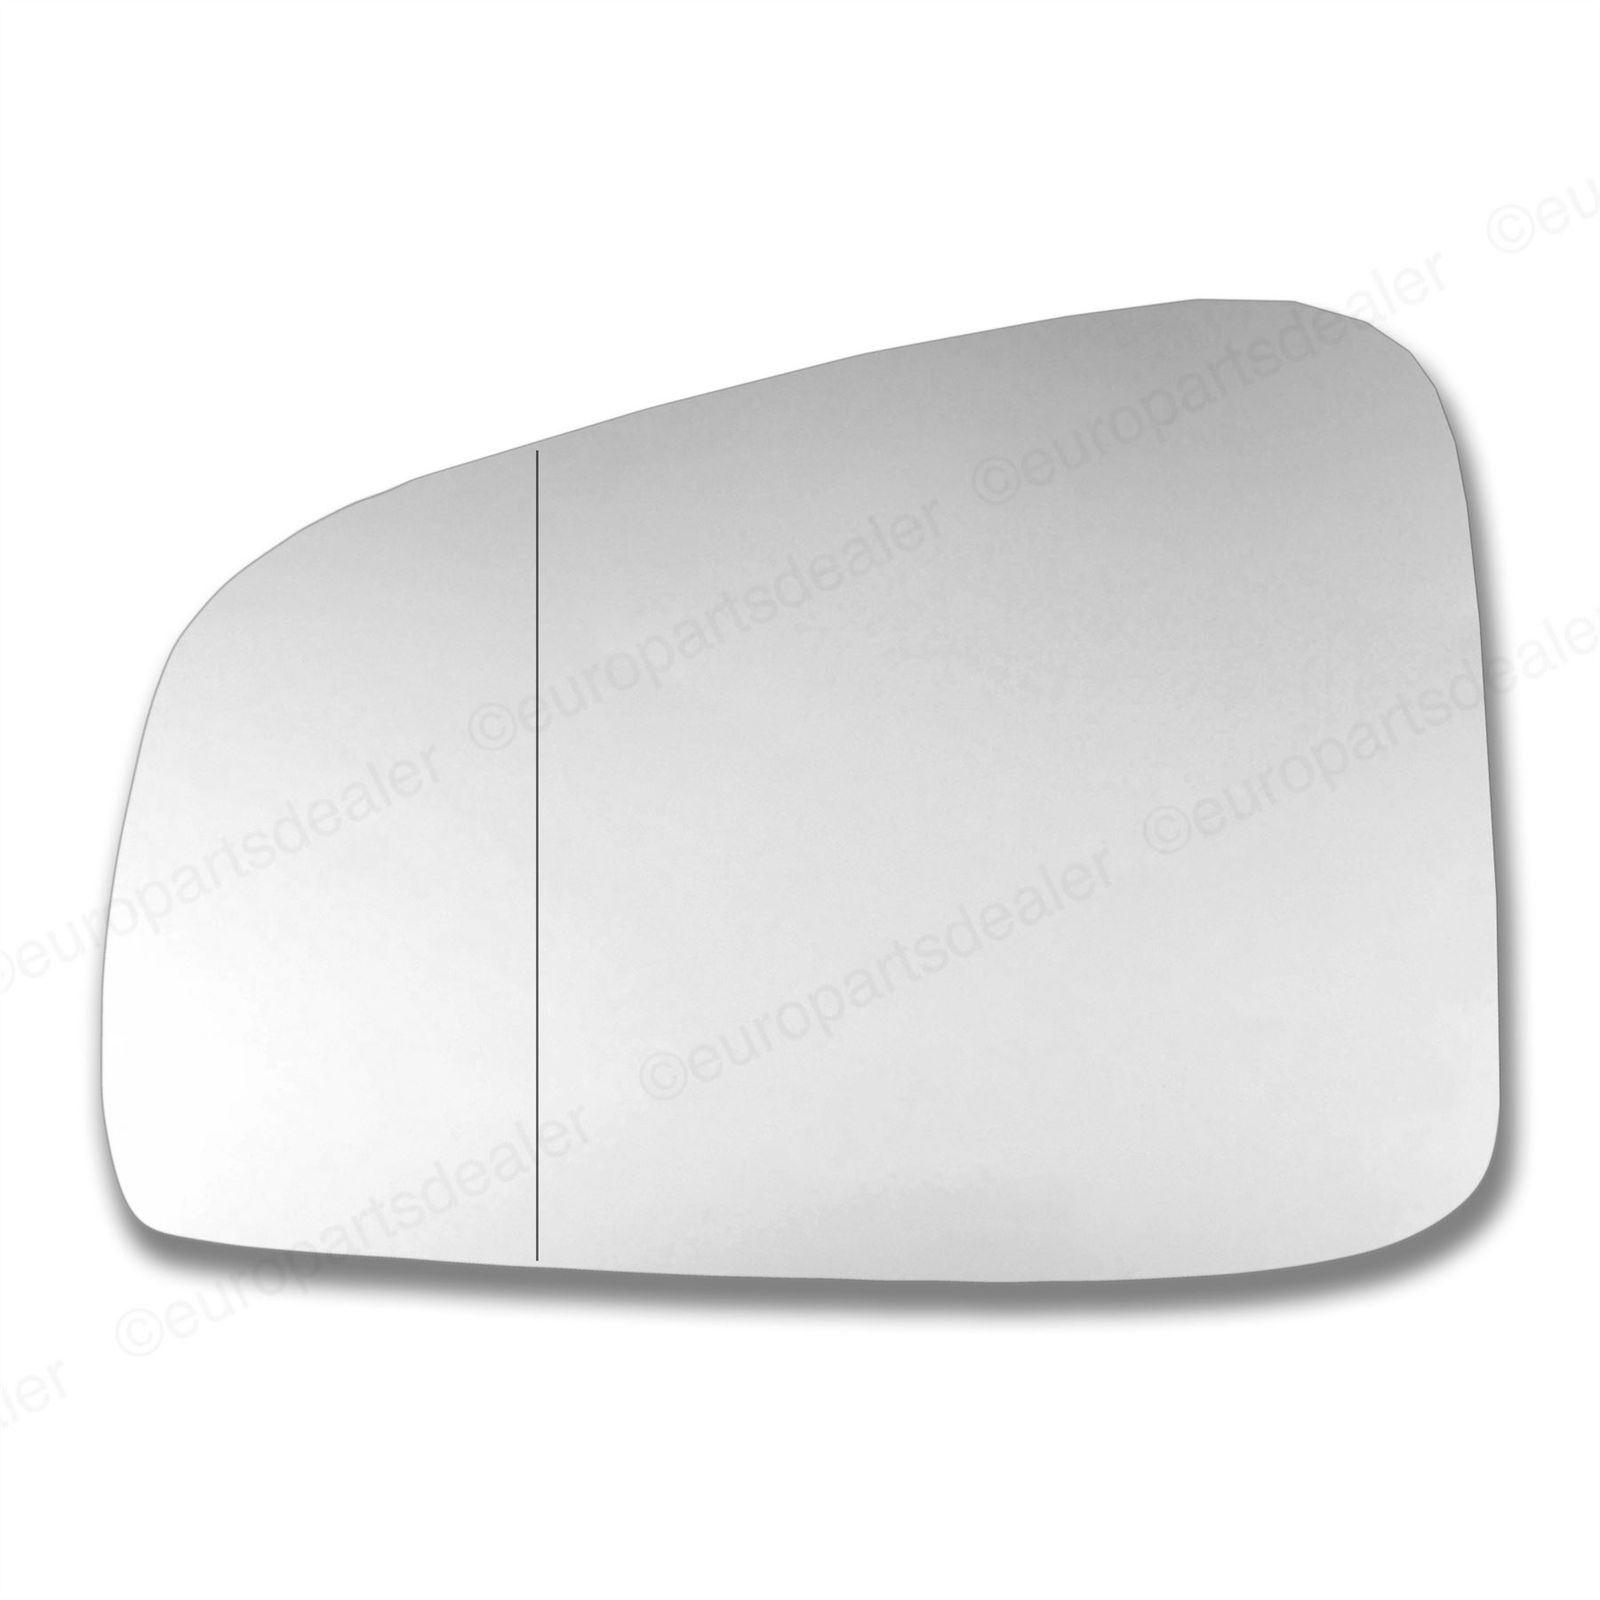 Lado Izquierdo Convexo ala Puerta Espejo Vidrio Para LDV Maxus 04-09 Placa